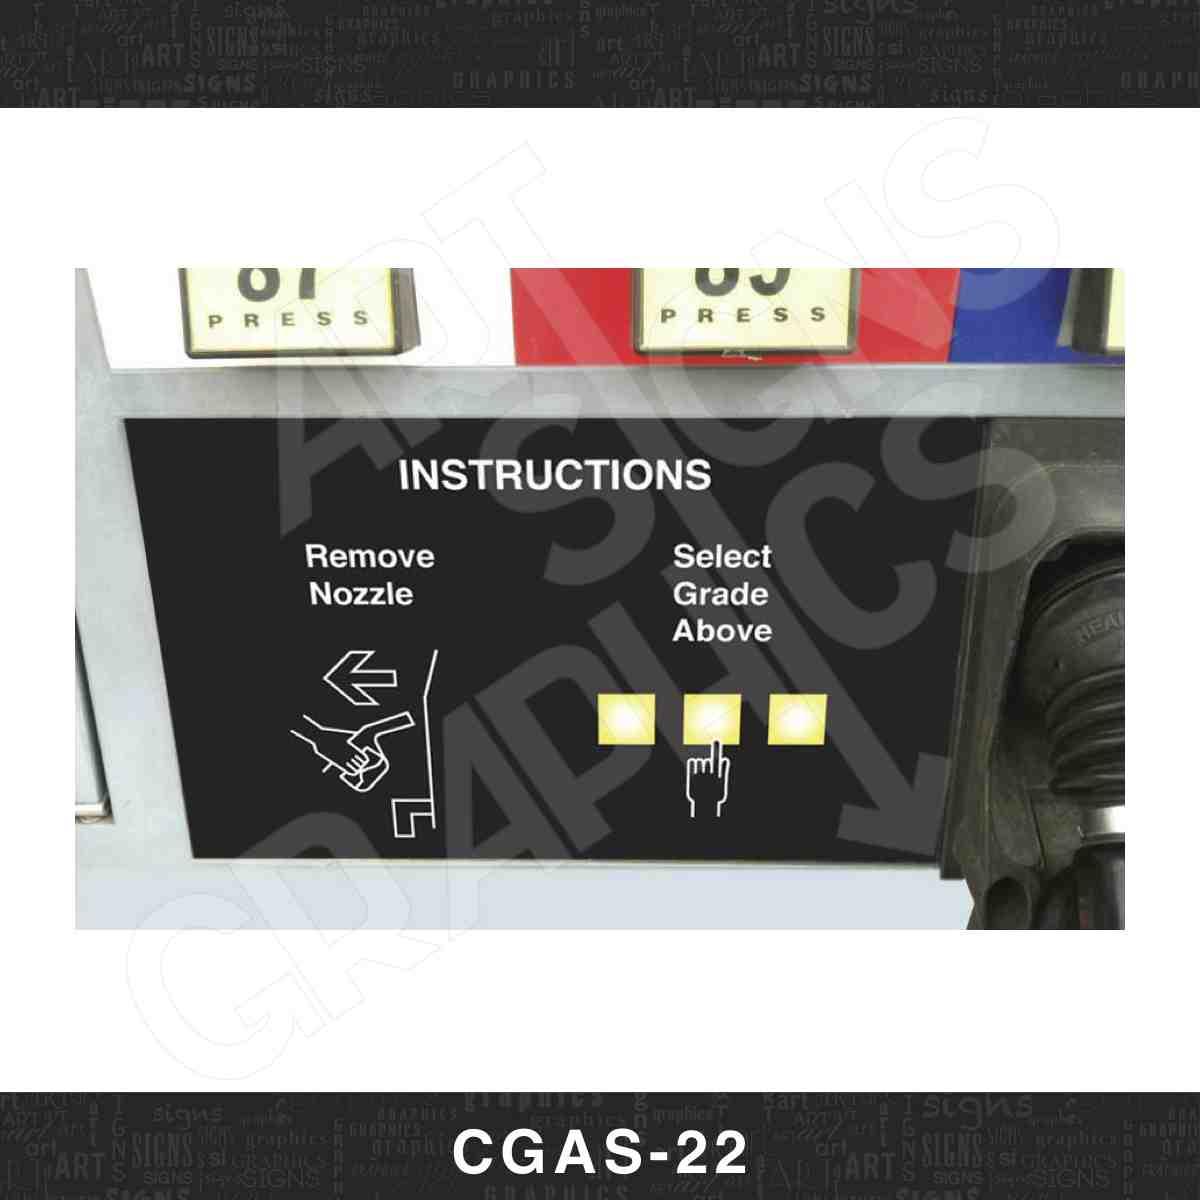 CGAS_22.jpg